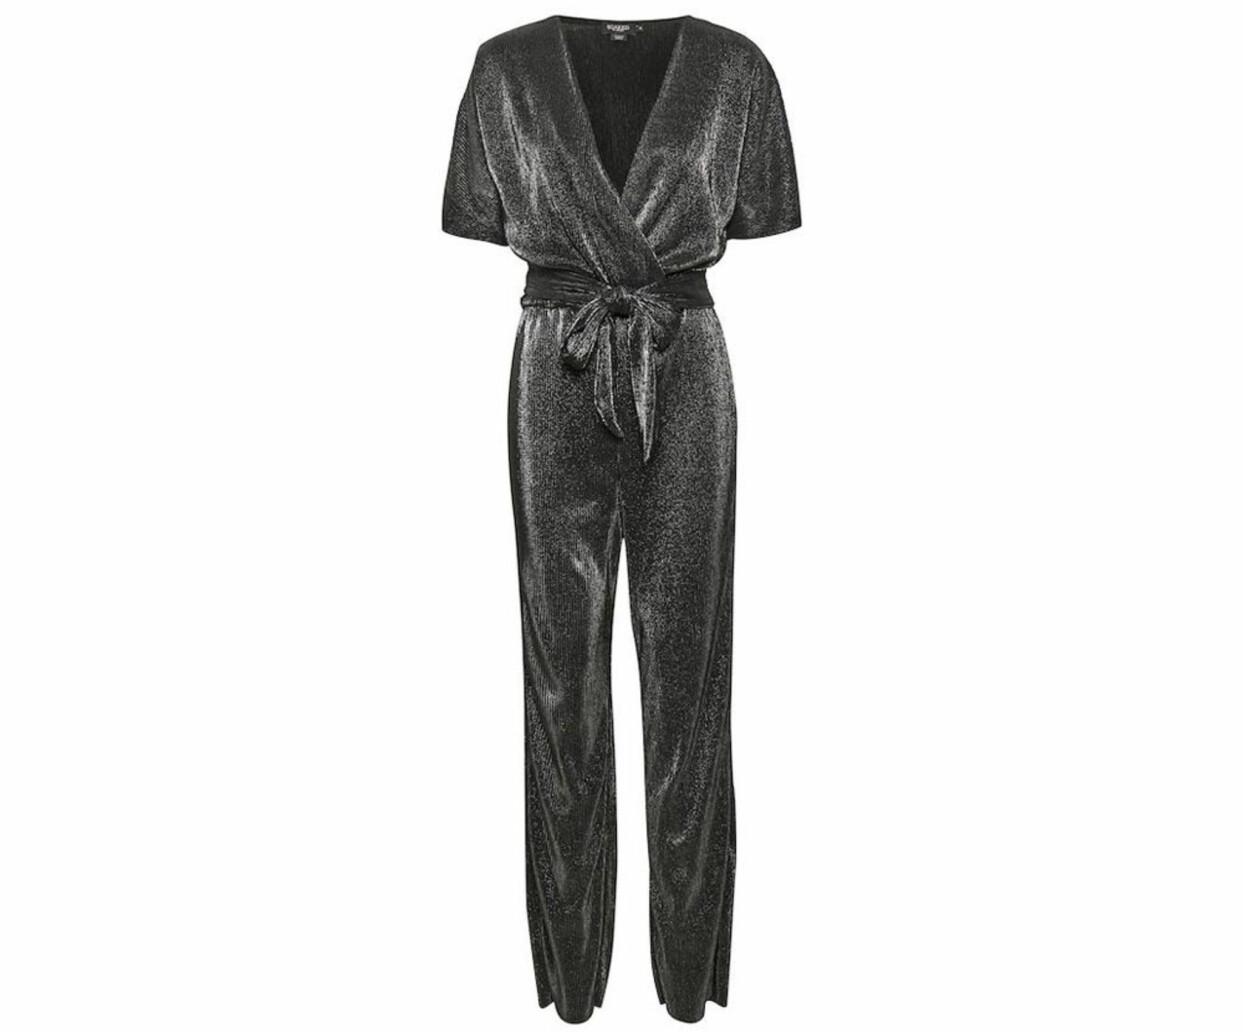 Silverskimrande jumpsuit med knytbälte, från Soaked in Luxury